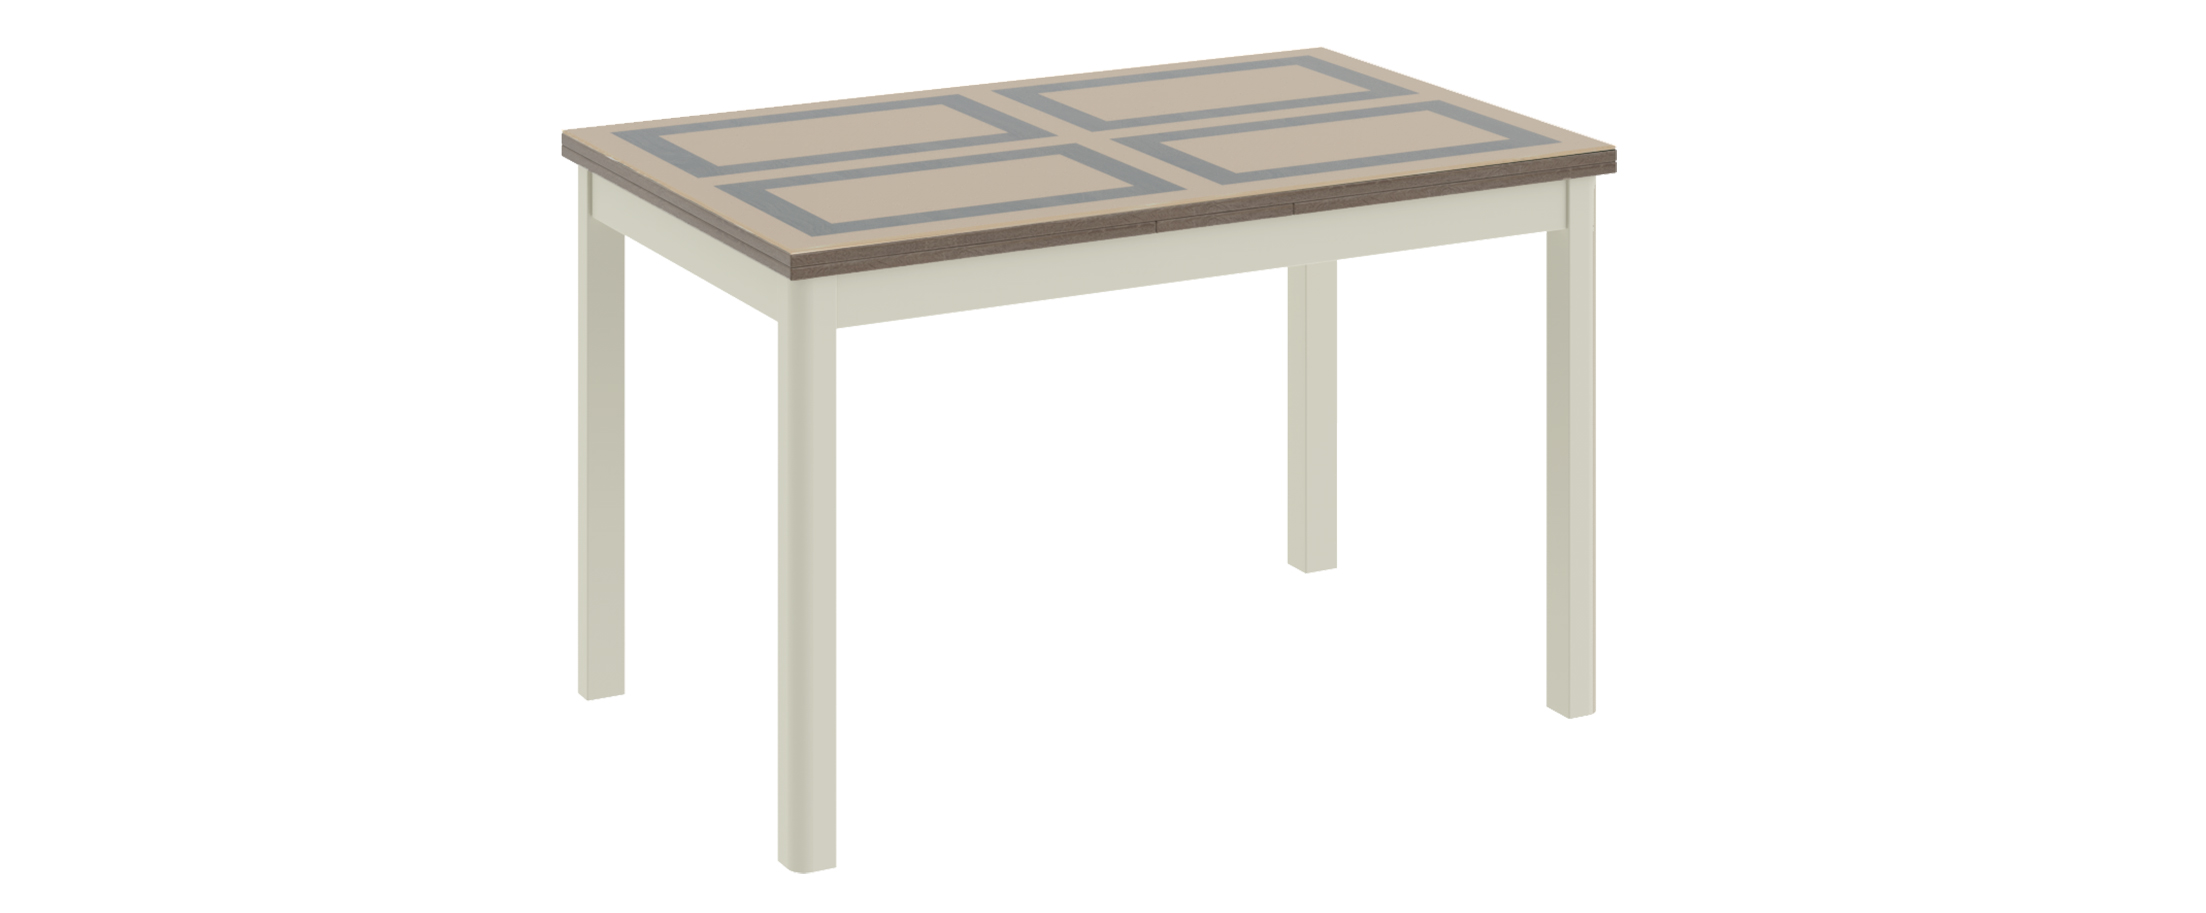 Стол обеденный Мельбурн Модель 3041